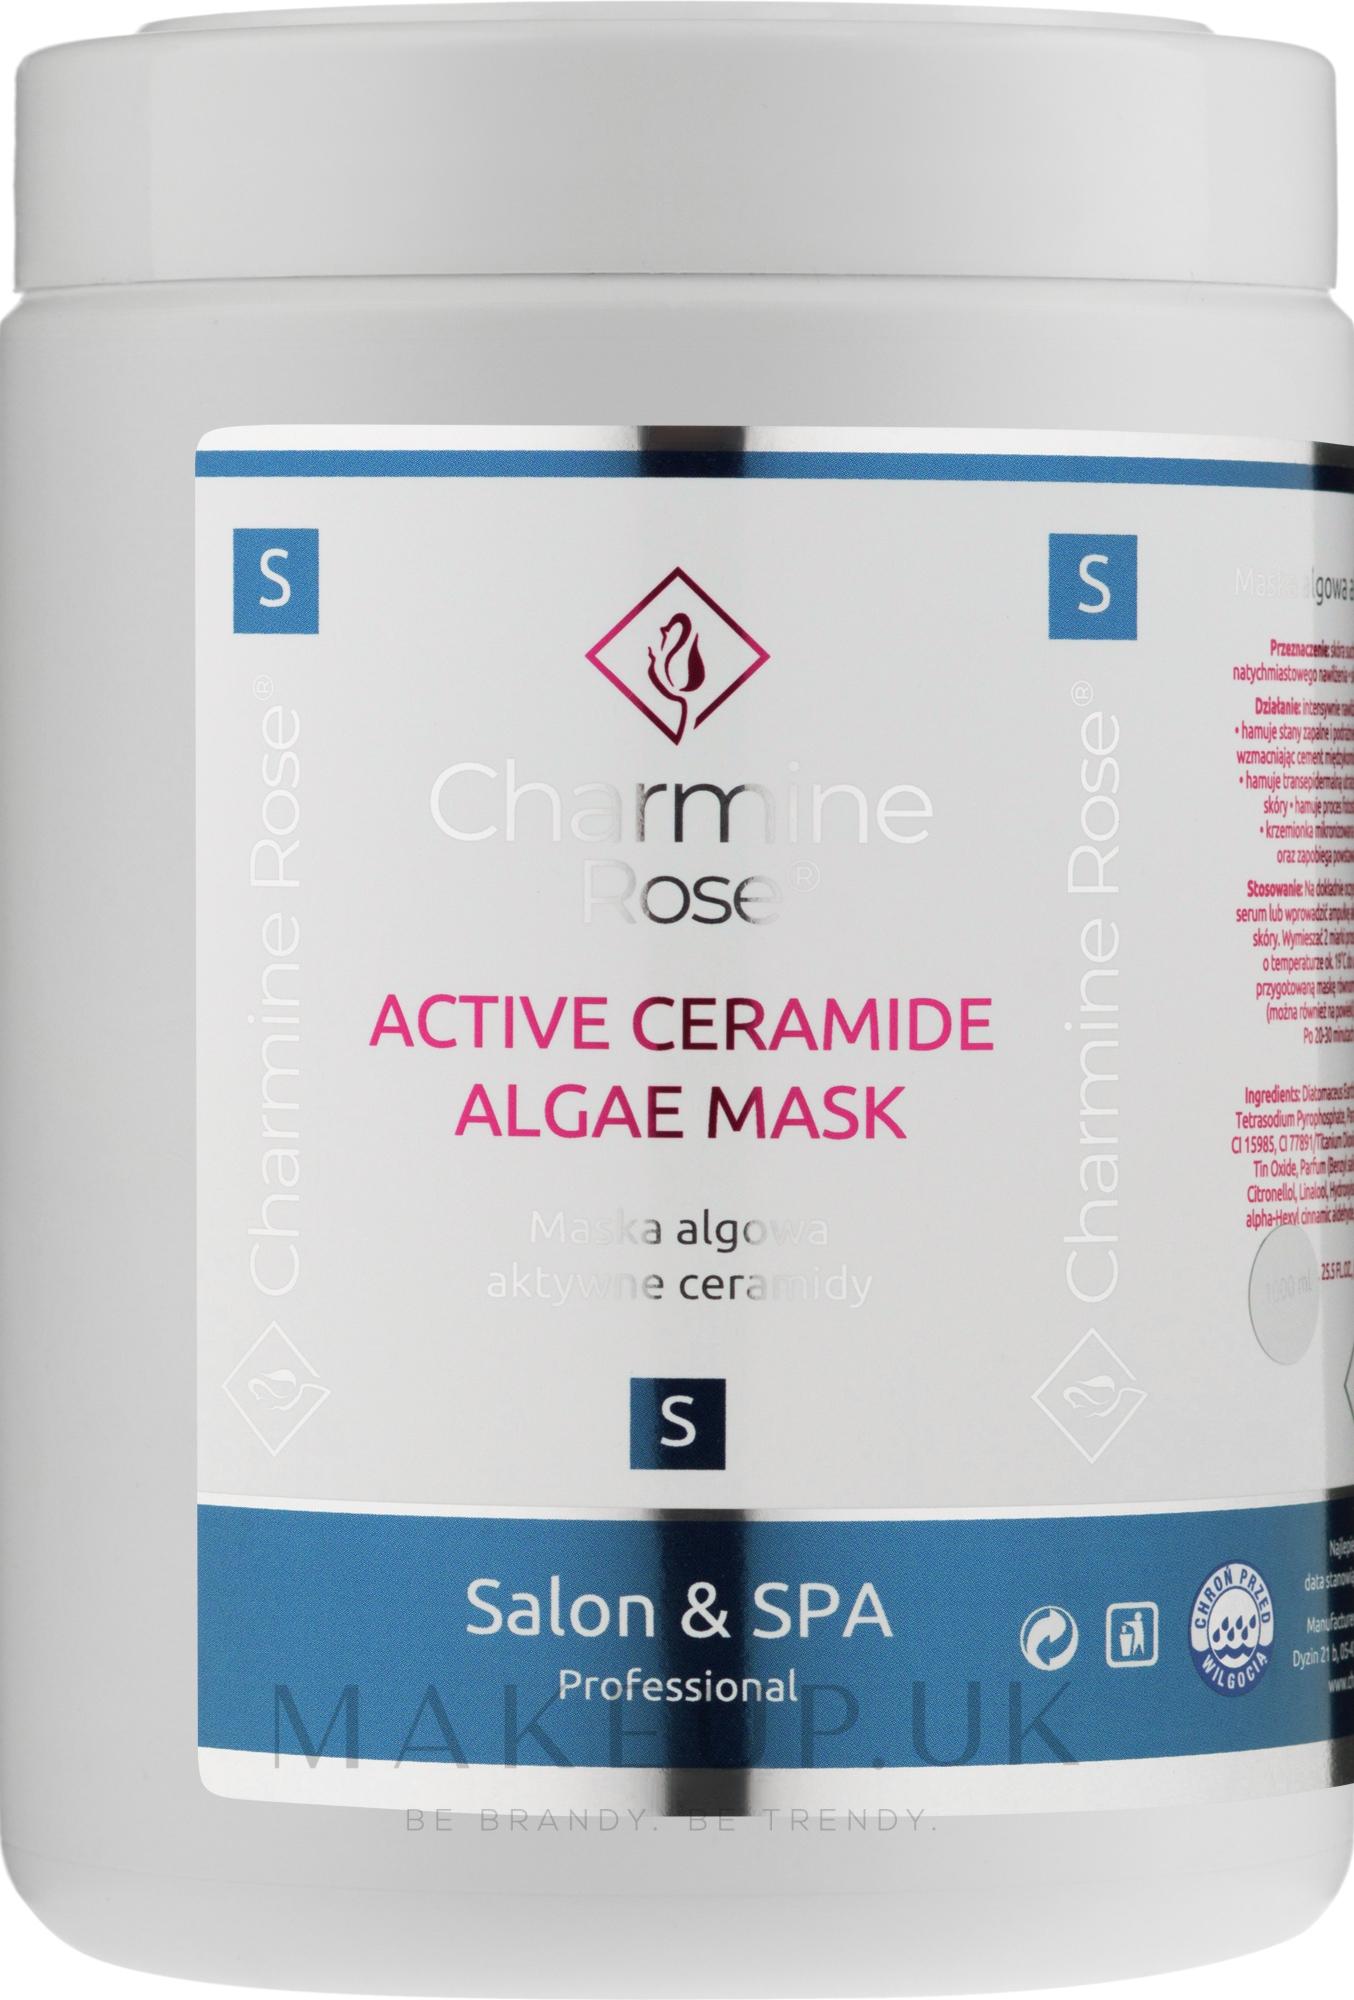 Alginate Face Mask with Ceramides - Charmine Rose Active Ceramide Algae Mask — photo 252 g